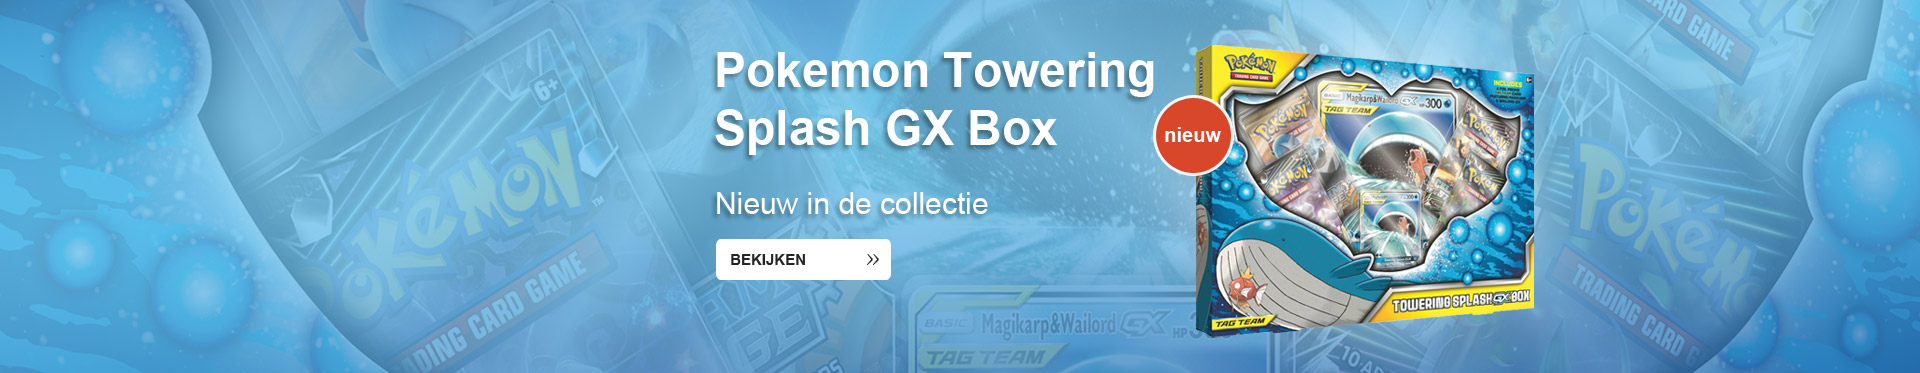 Pokemon - Tower Splash GX Box